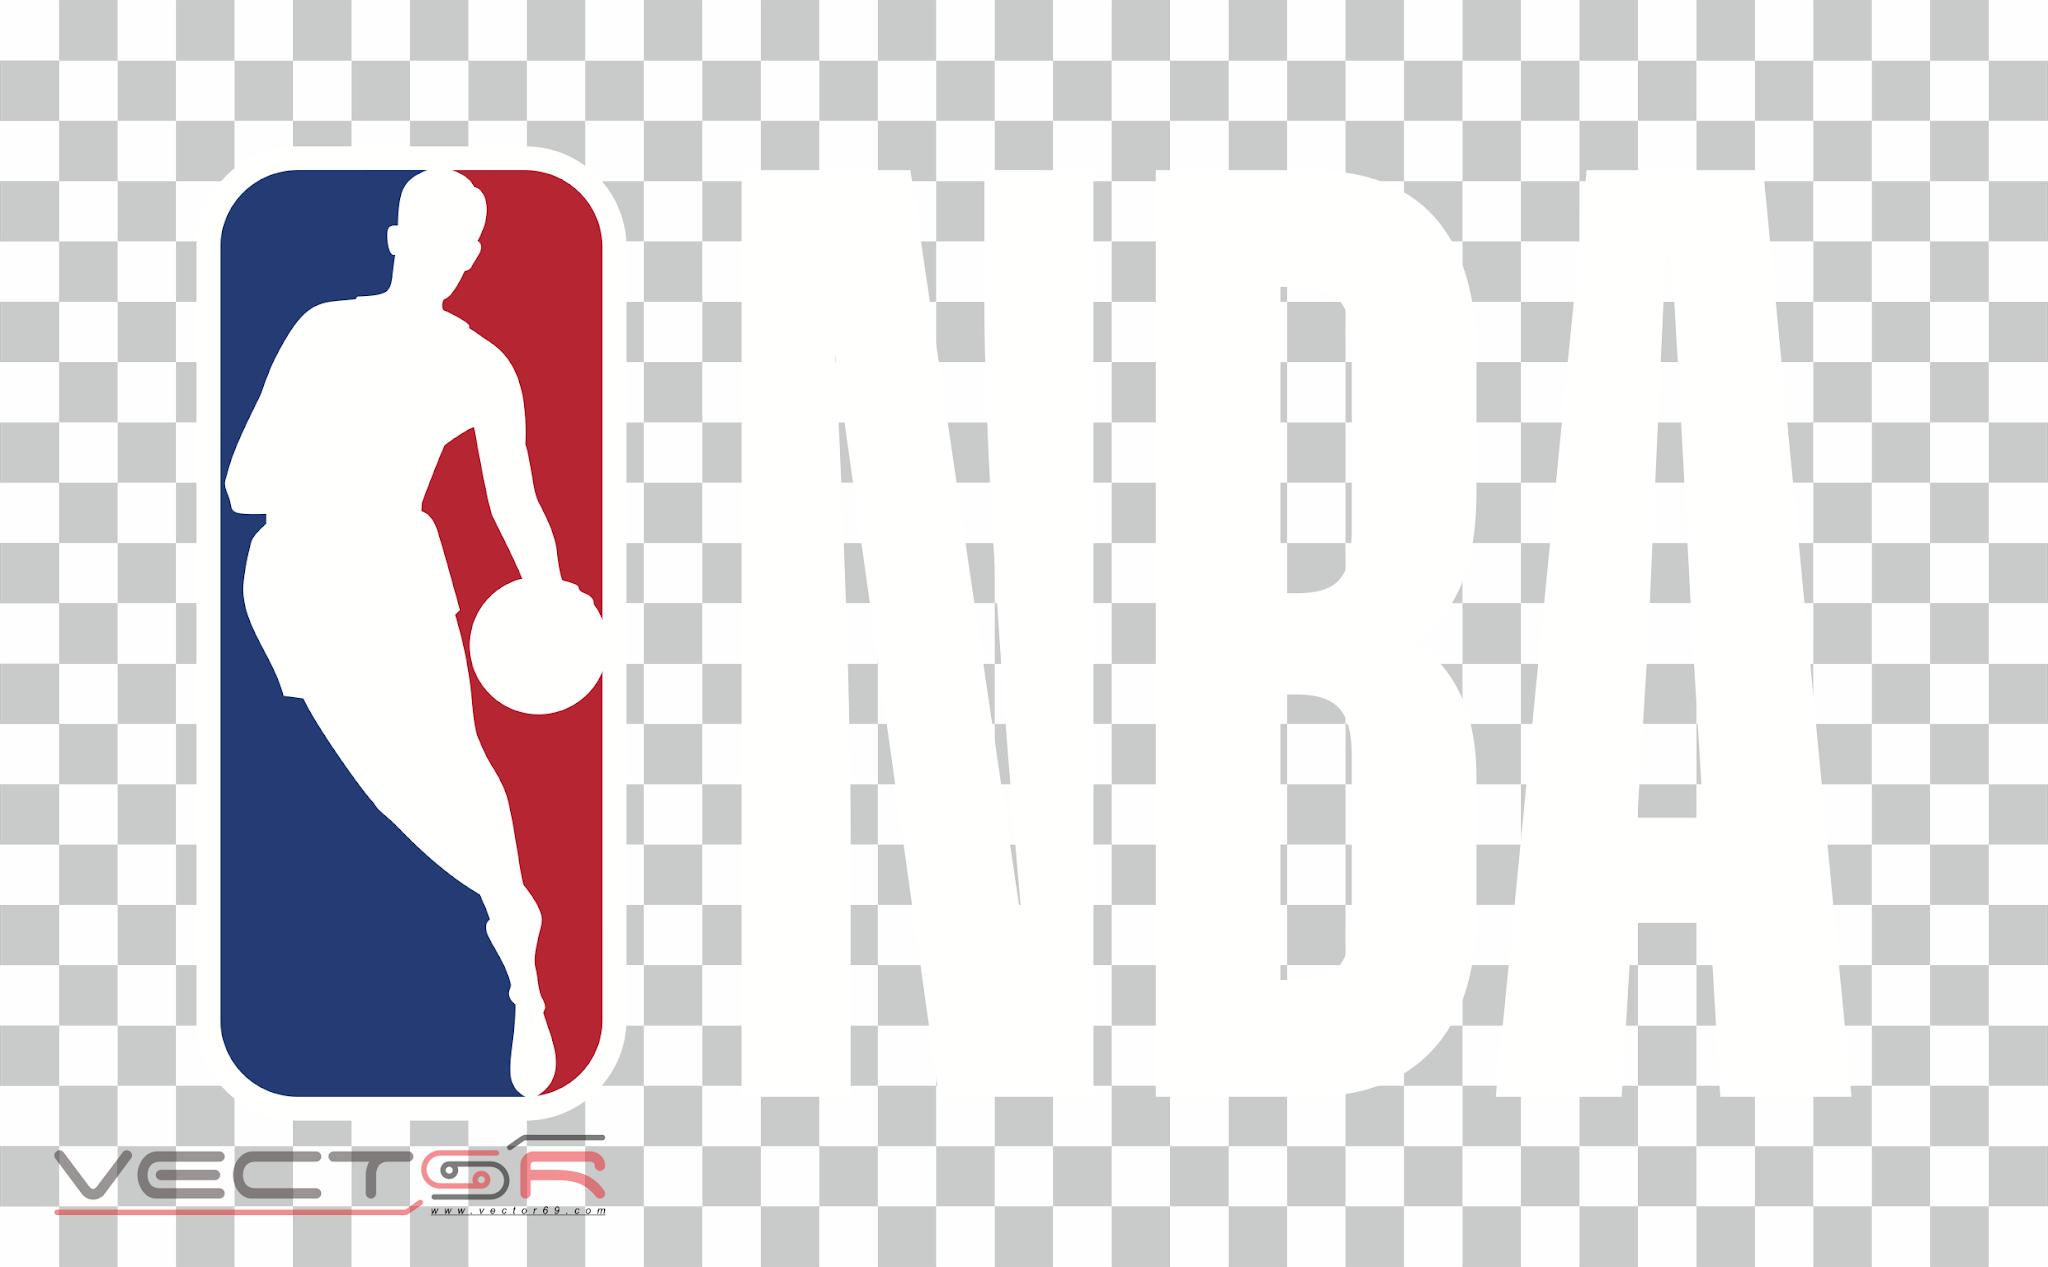 NBA (National Basketball Association) Logo - Download .PNG (Portable Network Graphics) Transparent Images